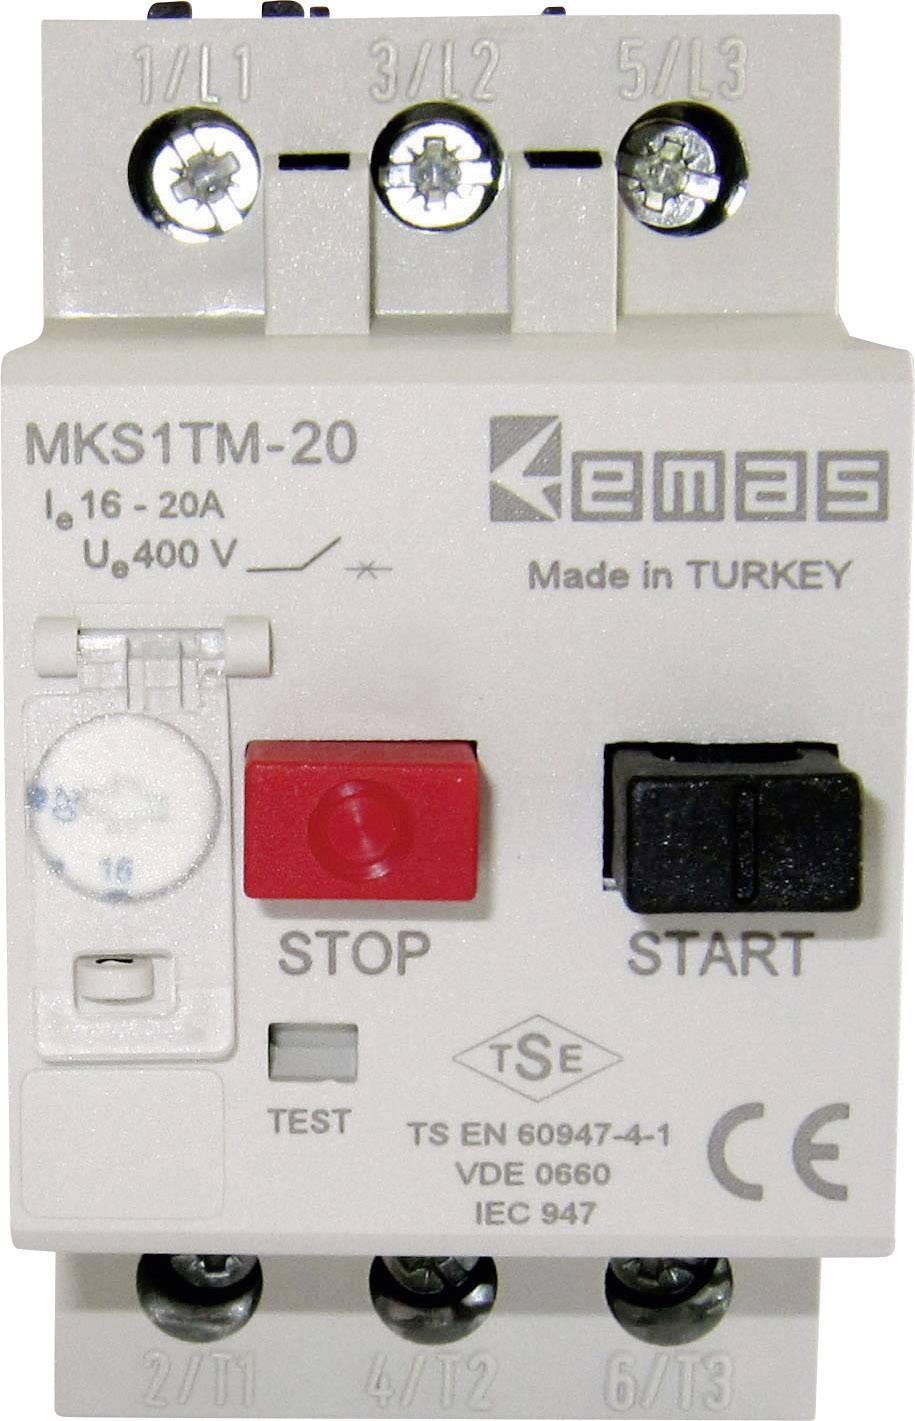 Ochranný spínač motora EMAS MKS1TM-20 MKS1TM-20, 400 V/AC, 20.0 A, 1 ks